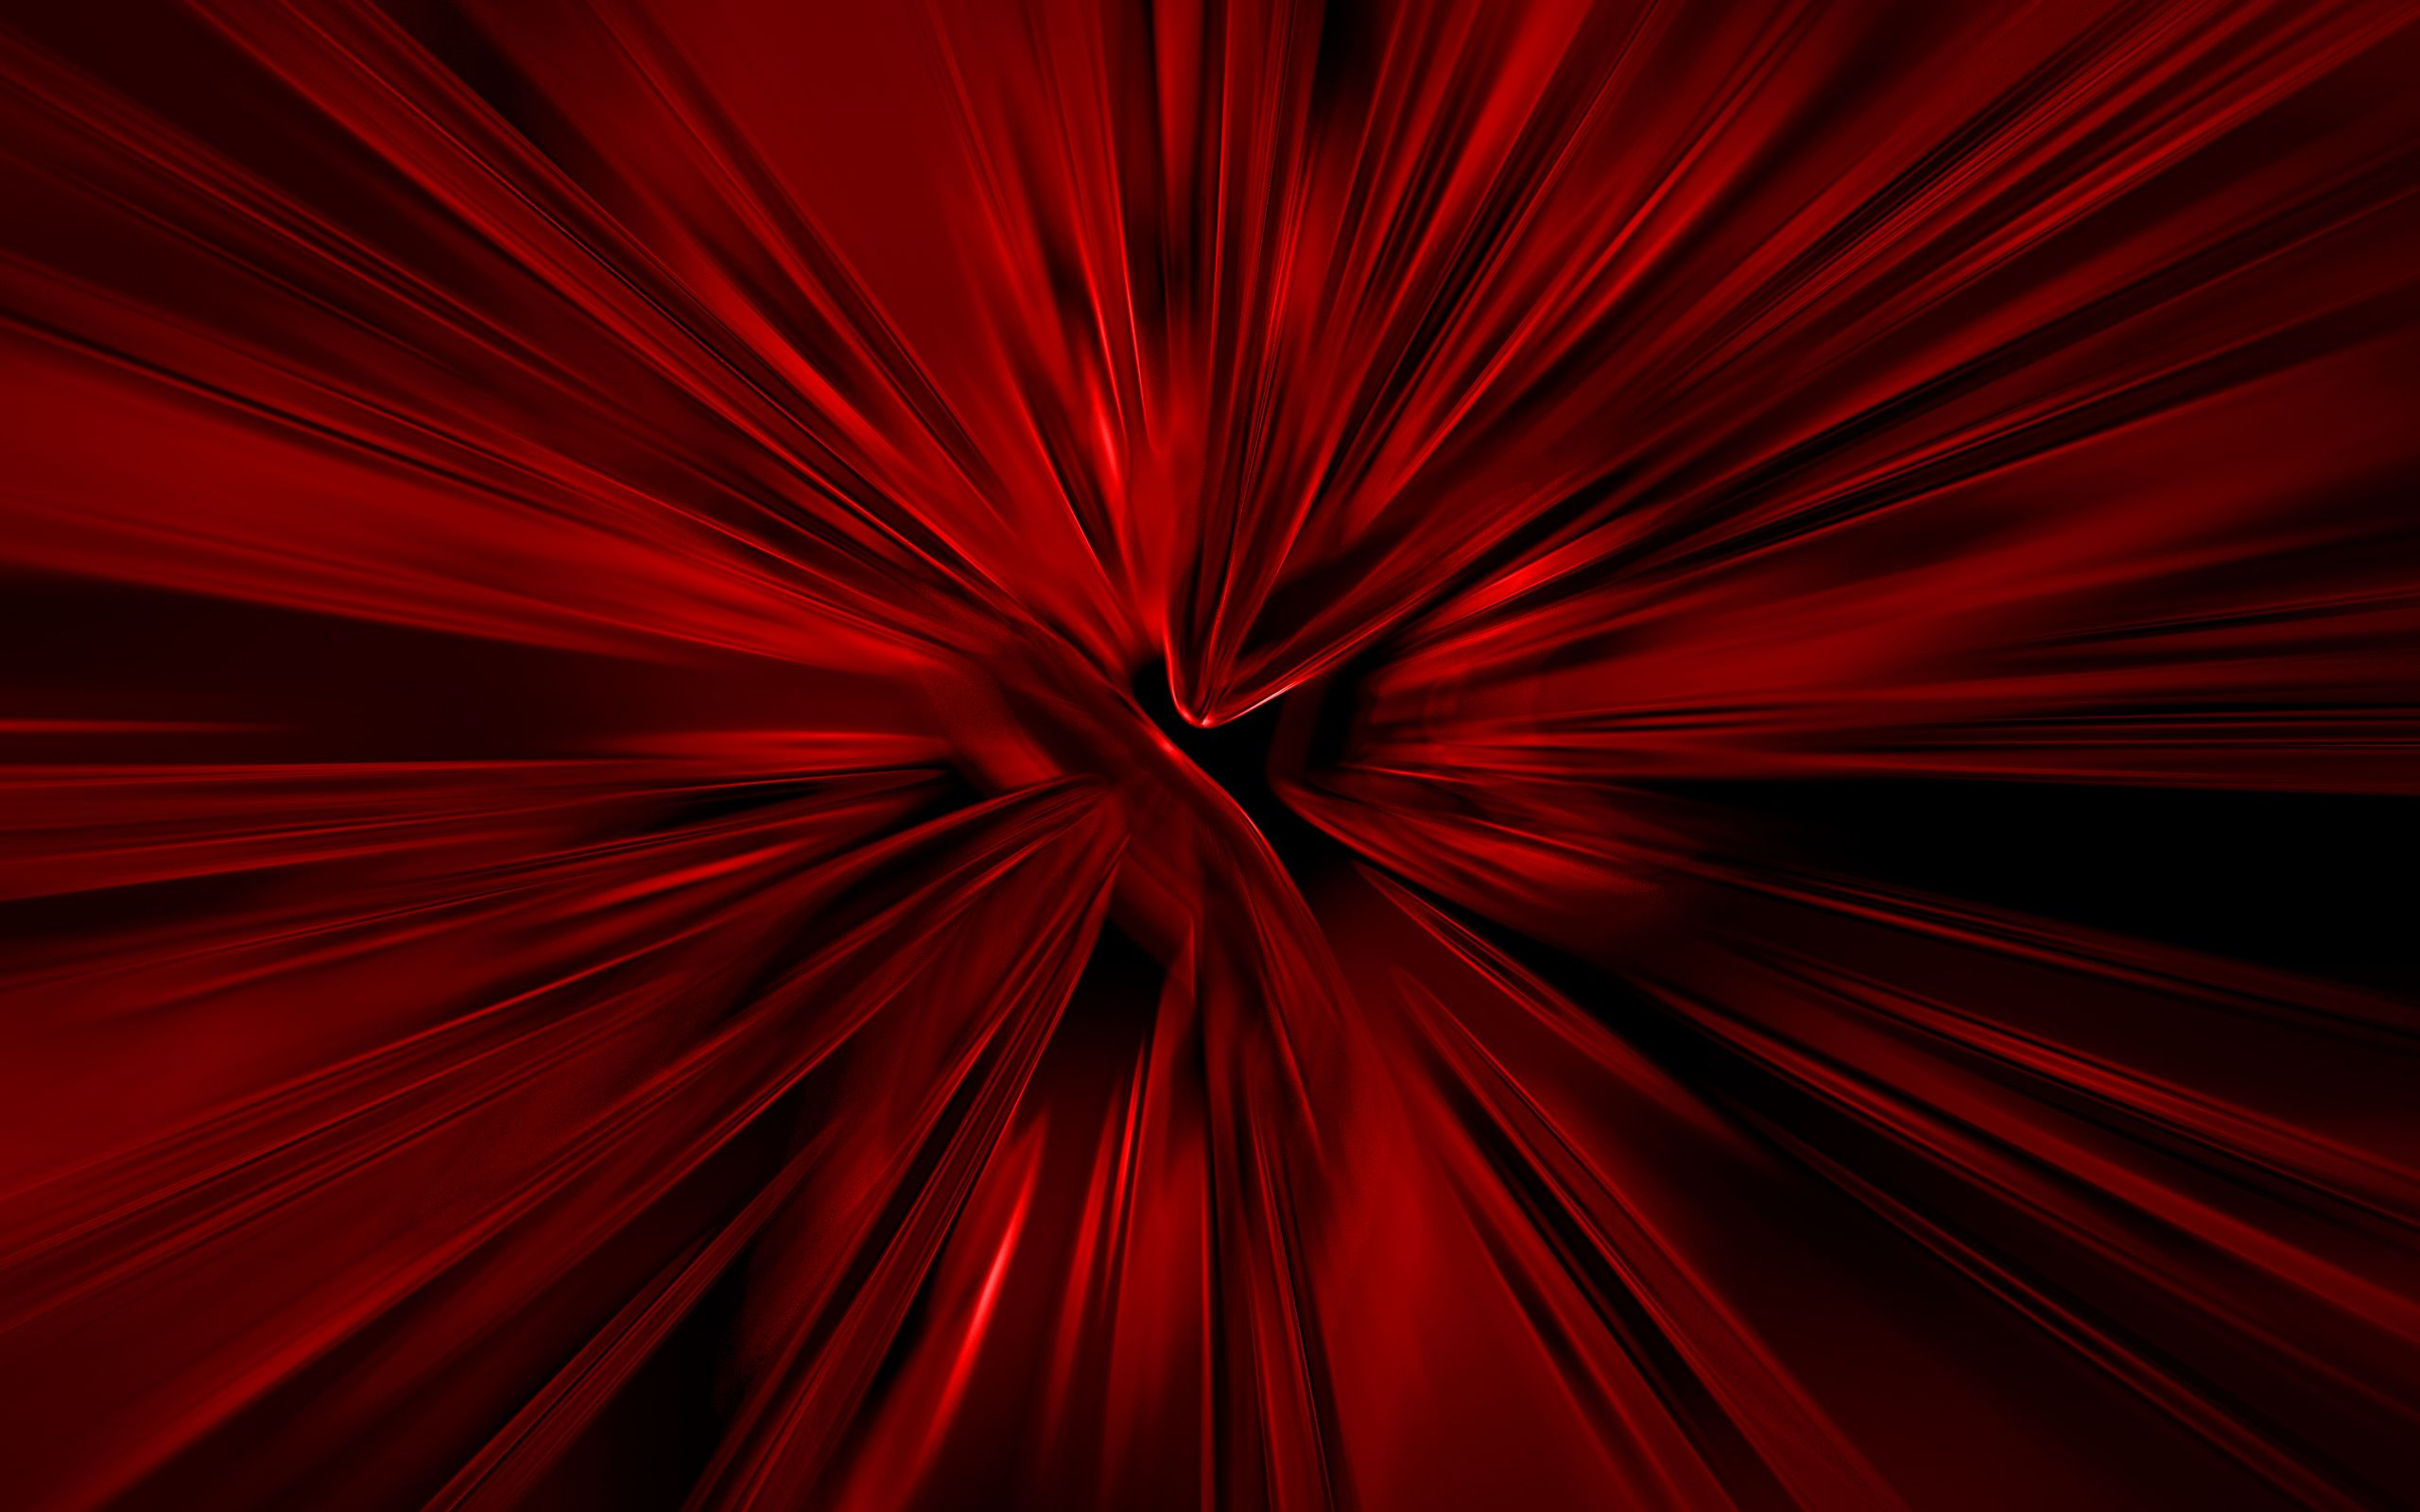 Black And Red Wallpaper Free Download 1 Wallpaper Wiki Red Wallpaper Black And White Wallpaper Iphone Dark Red Wallpaper